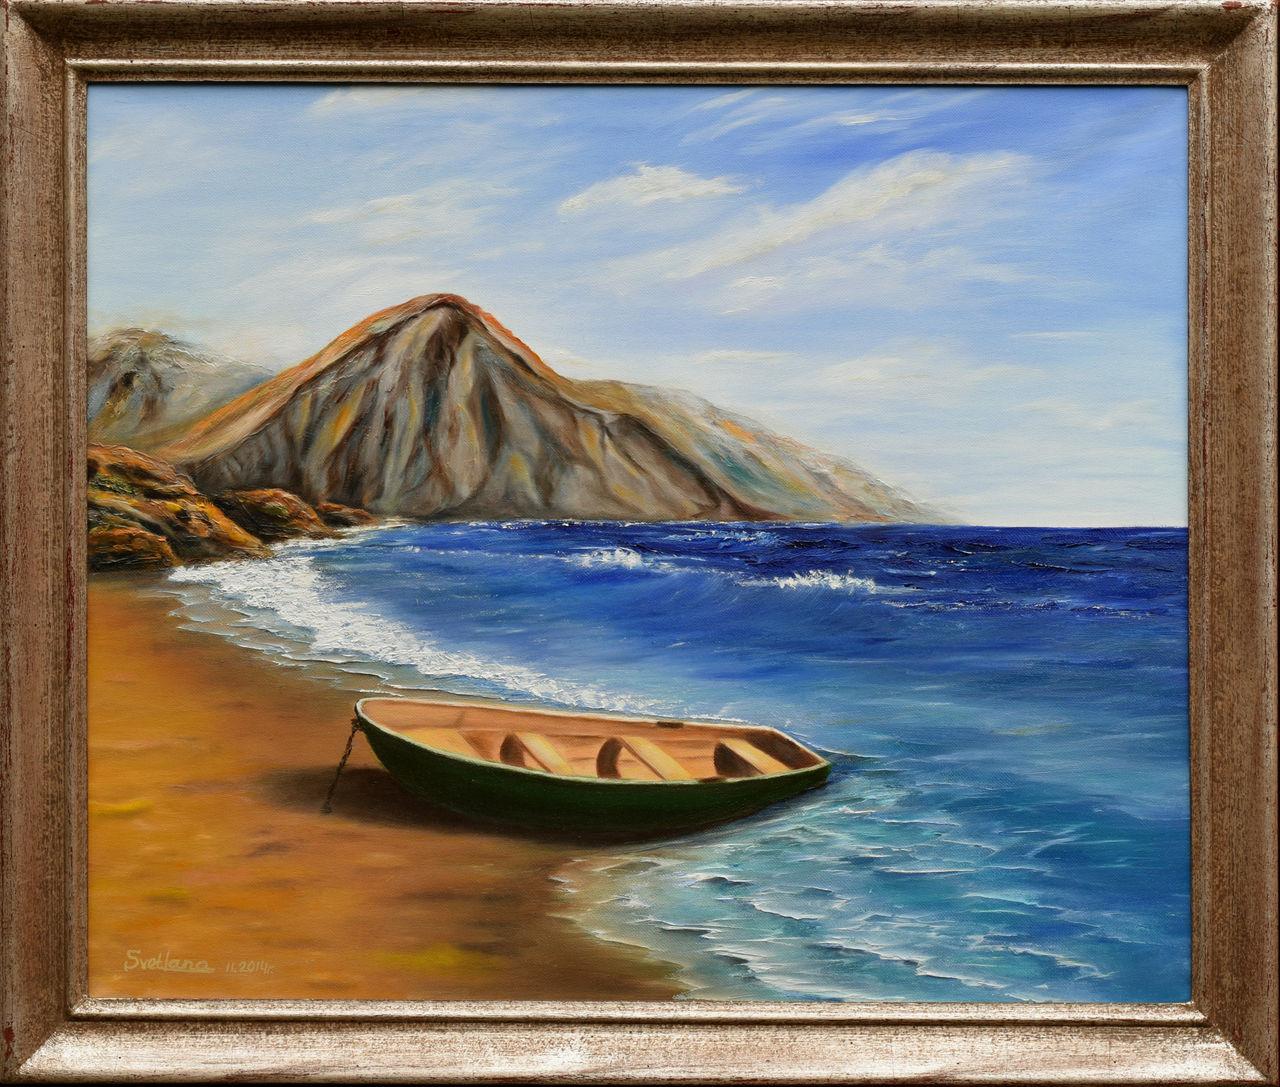 Bild: Gemälde, Rahmen, Meer, Landschaft von Svetlana Shumska bei ...